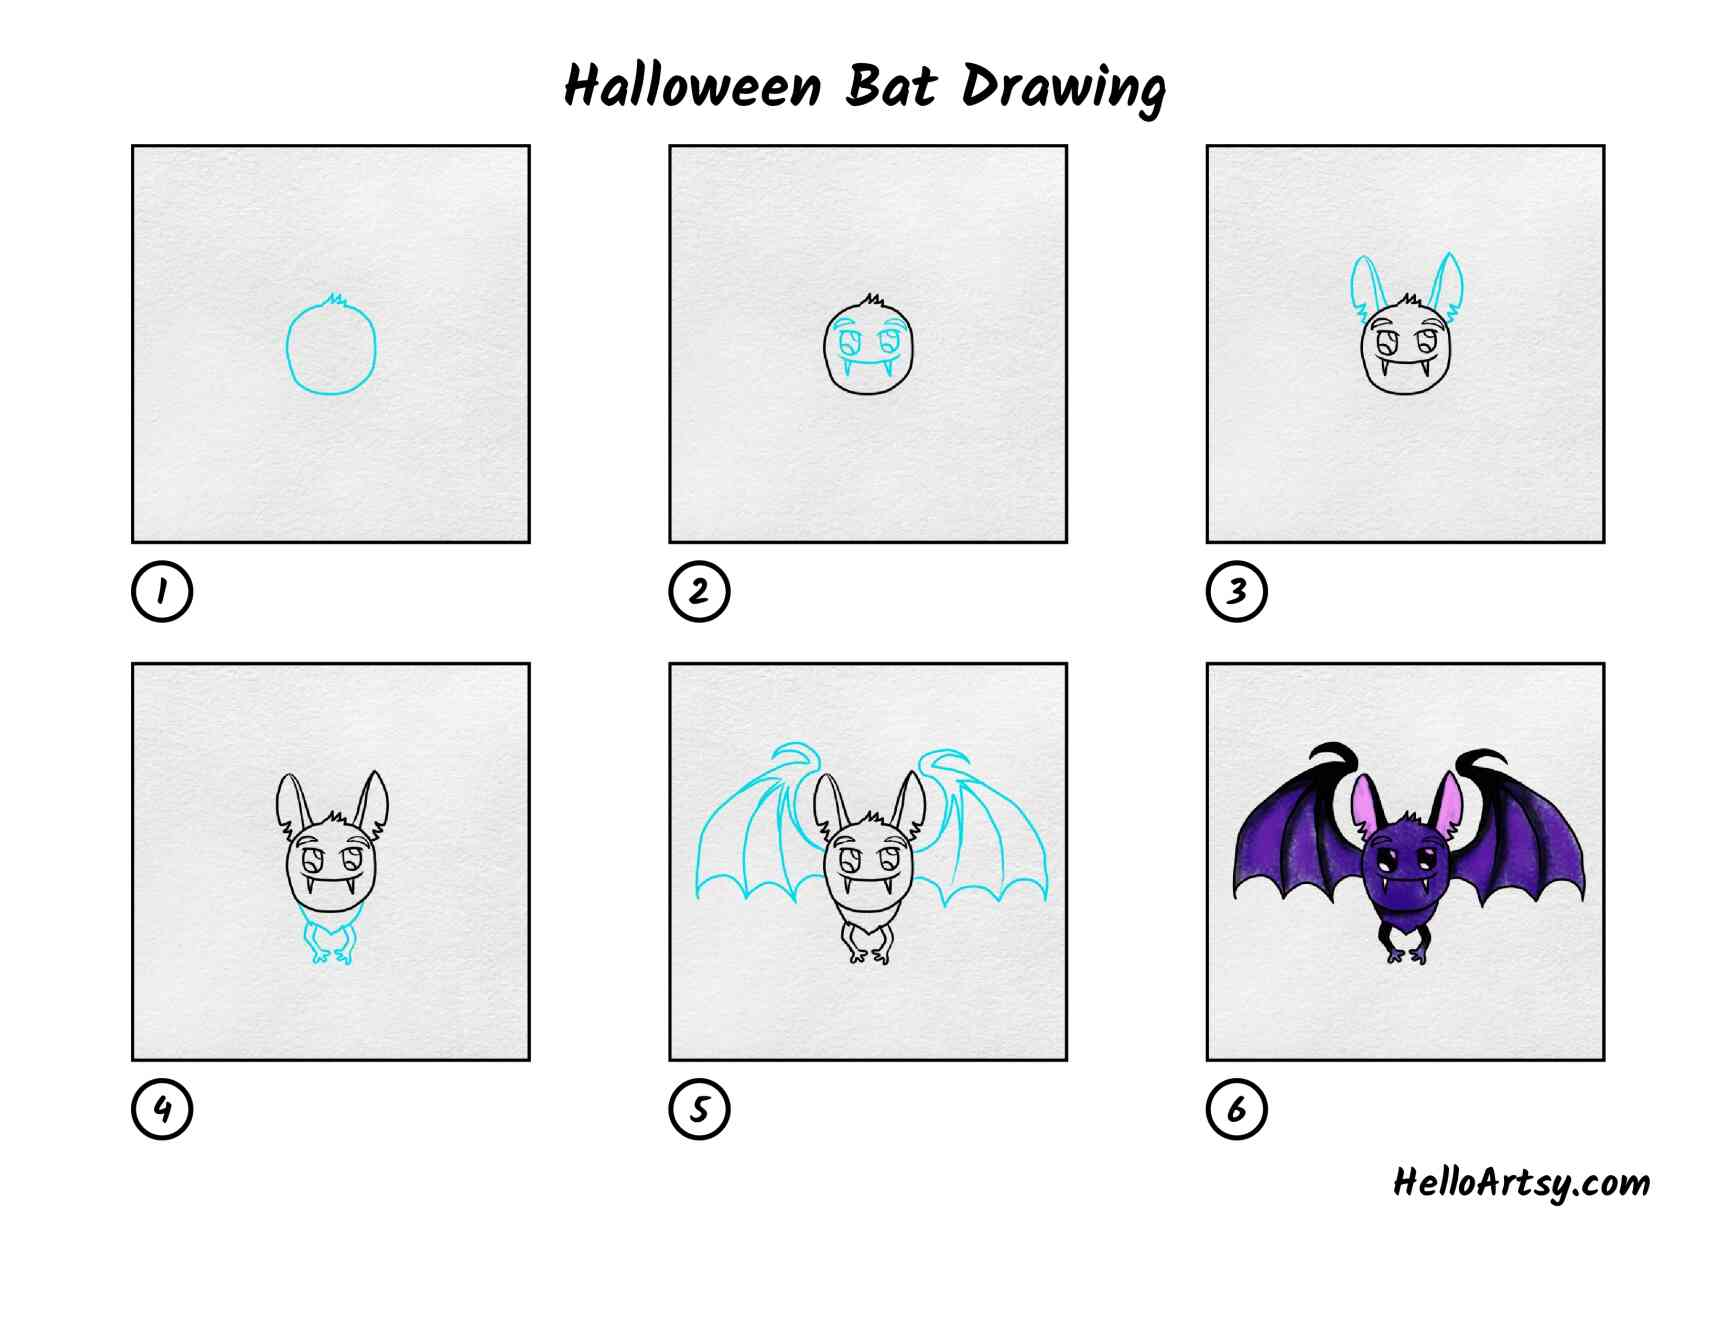 Halloween Bat Drawing: All Steps